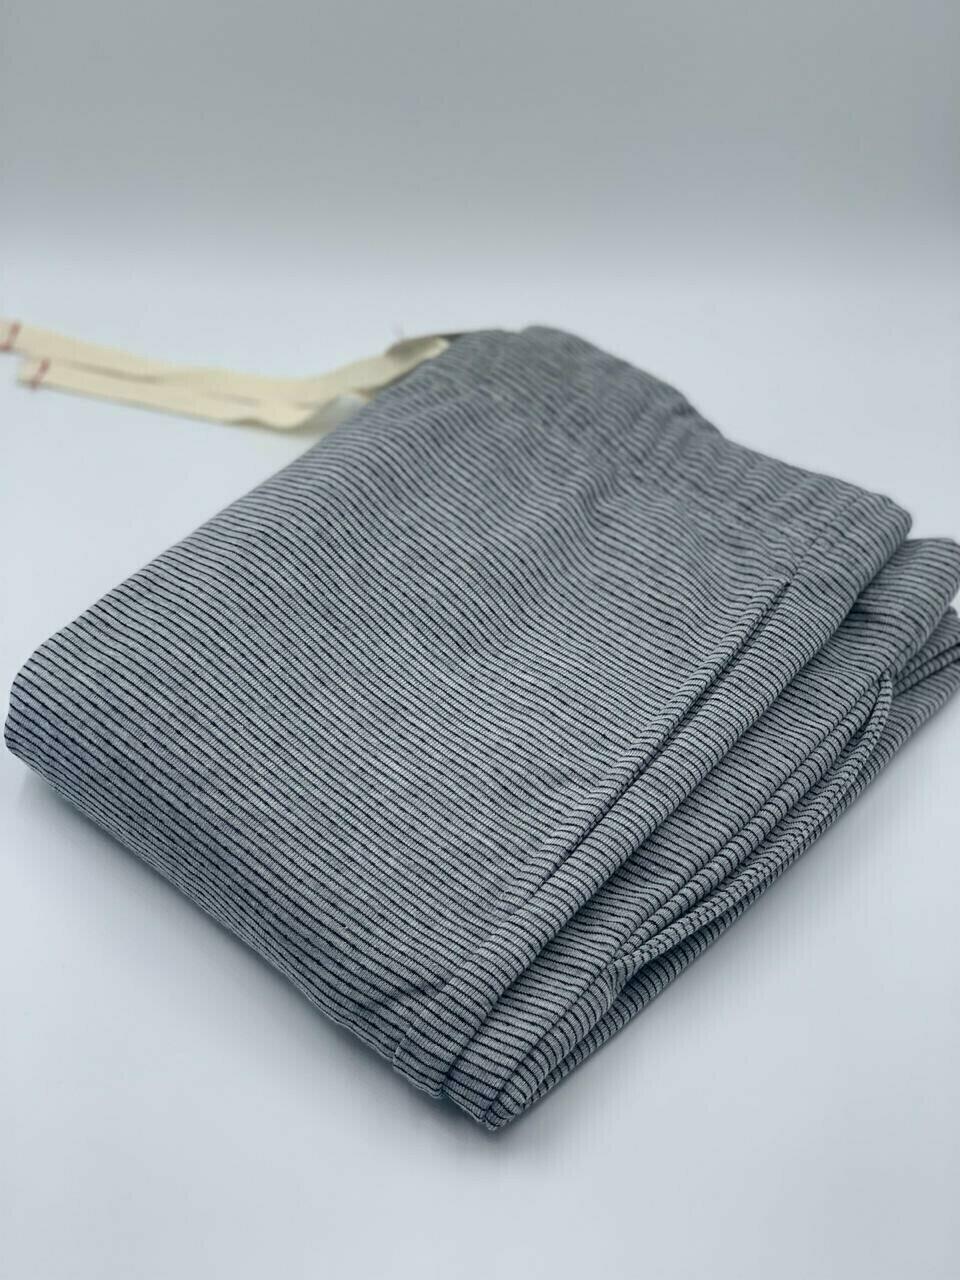 Short Pijama Cantel Sleep Caballero 35%Alg/65%Pol  Gris Claro Línea 20-21